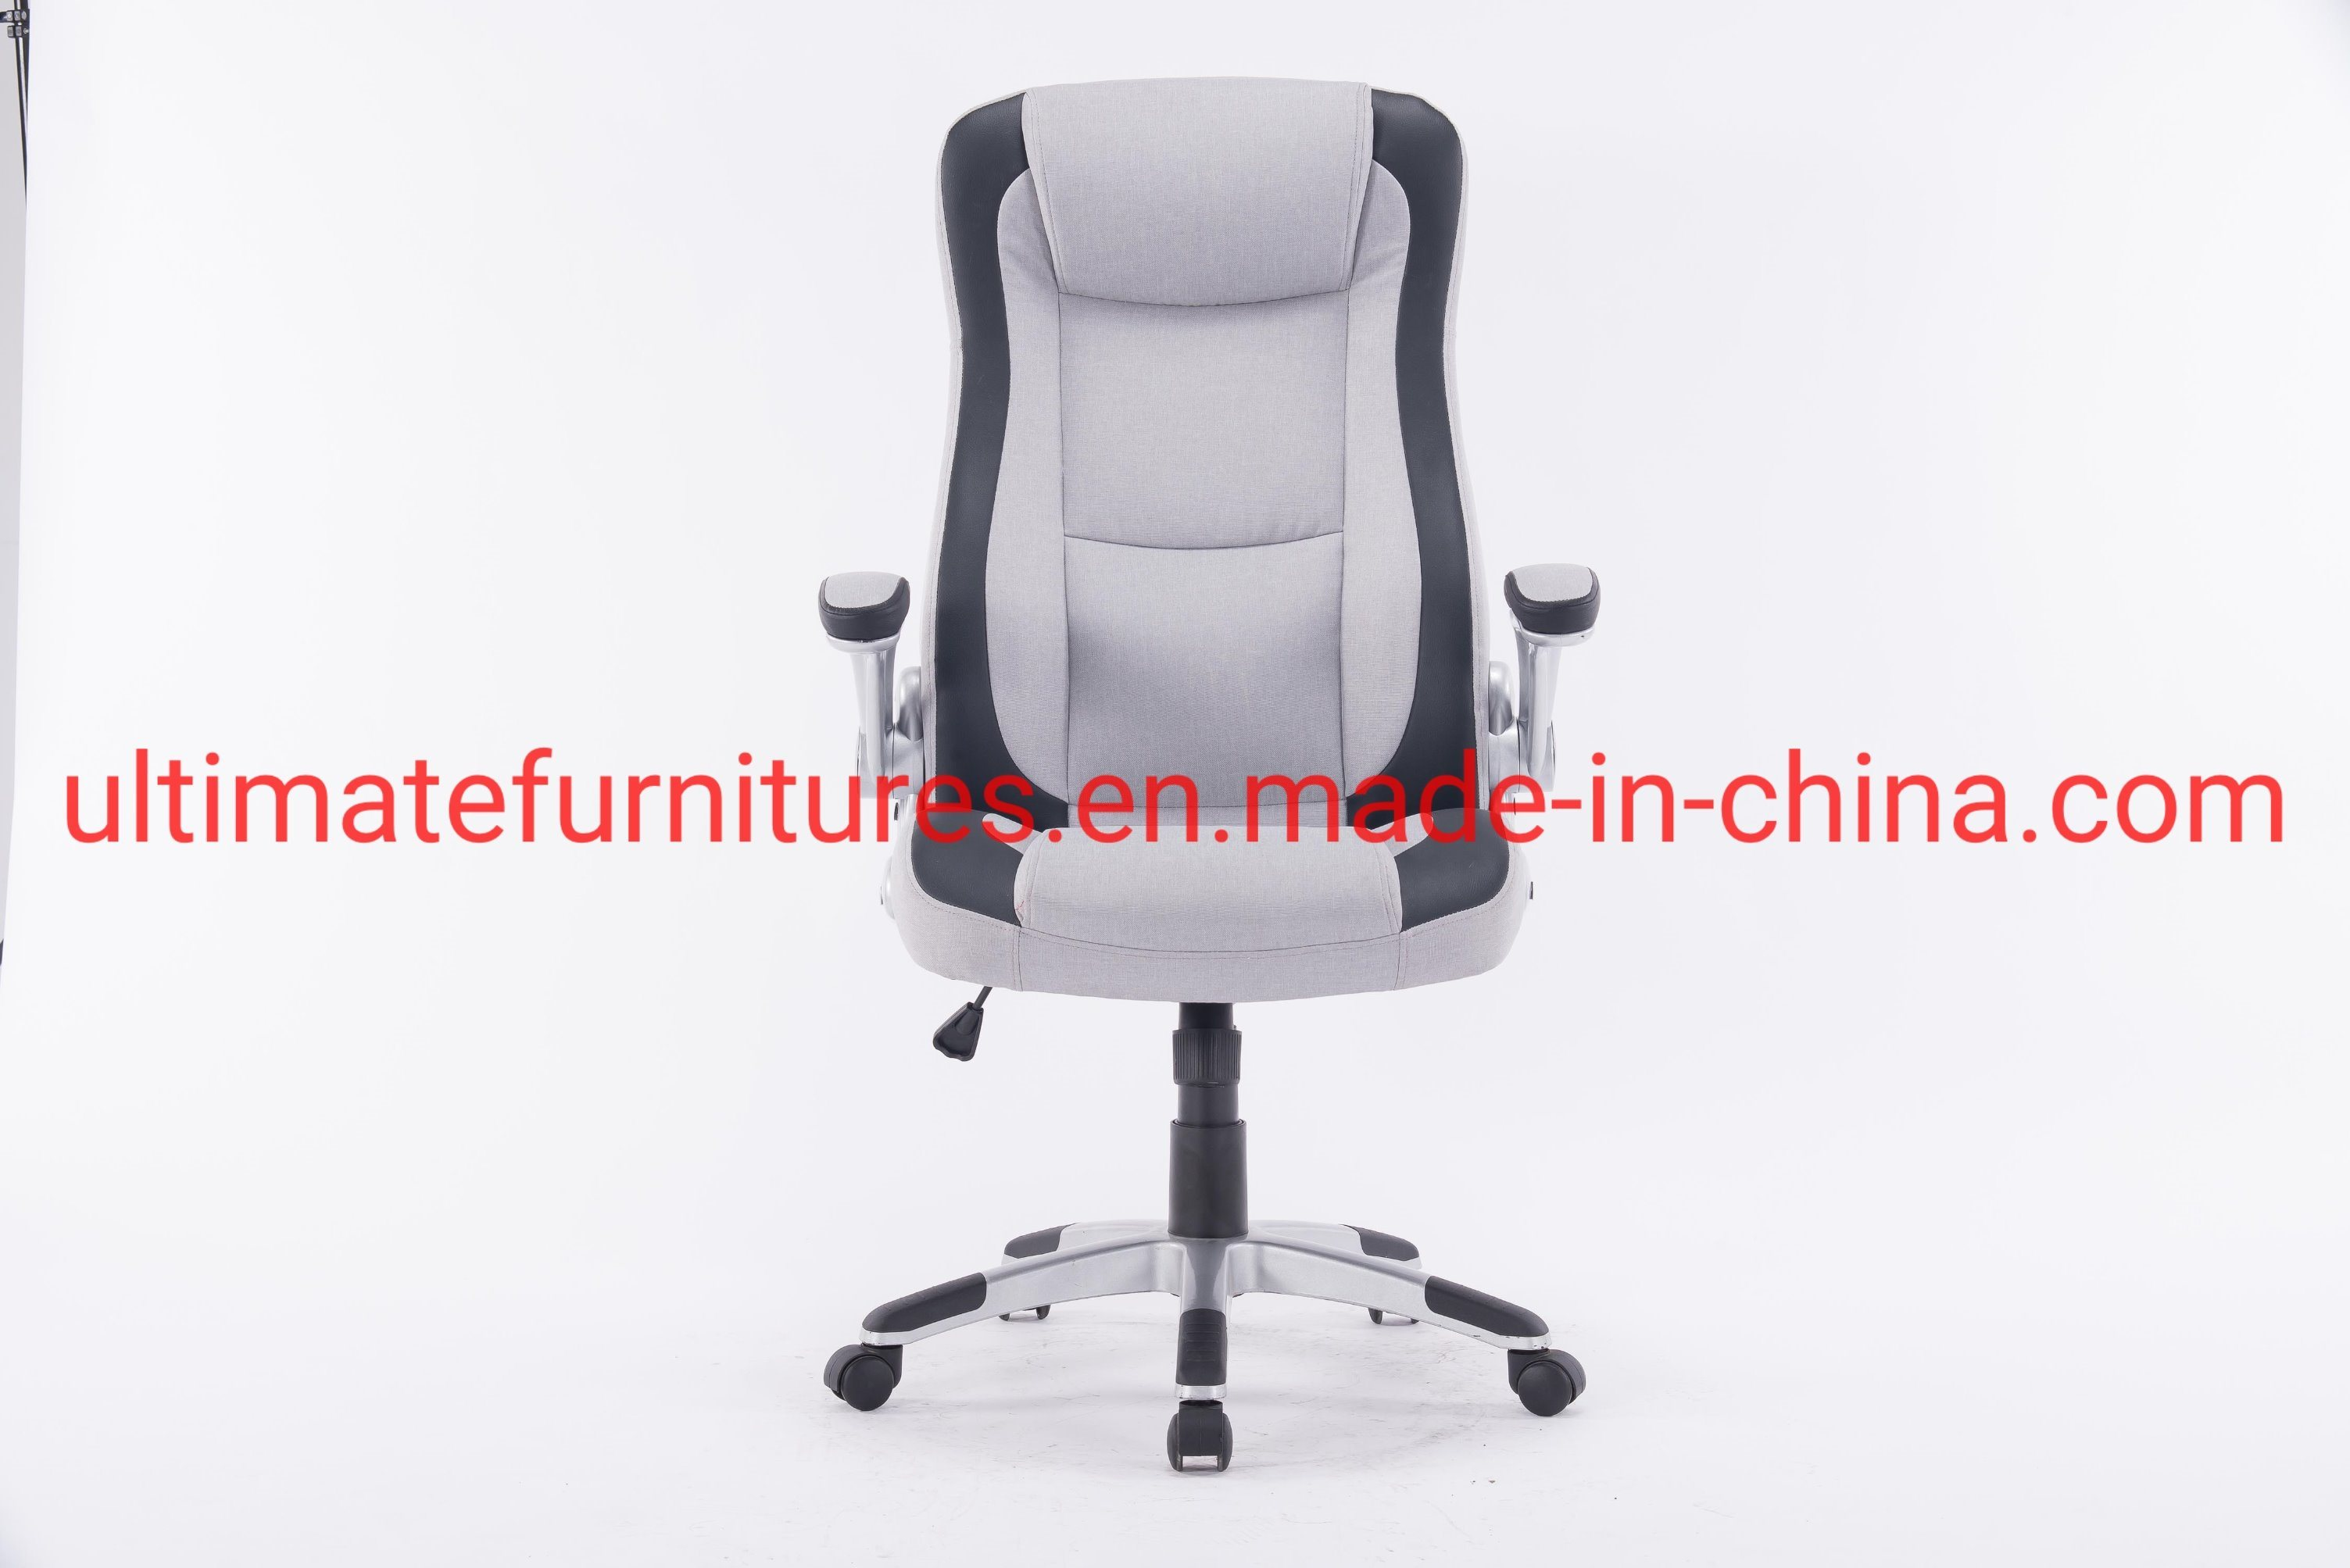 [Hot Item] Office Chair Fabric Desk High Back Ergonomic Adjustable Racing  Chair Task Swivel Executive Computer Chair